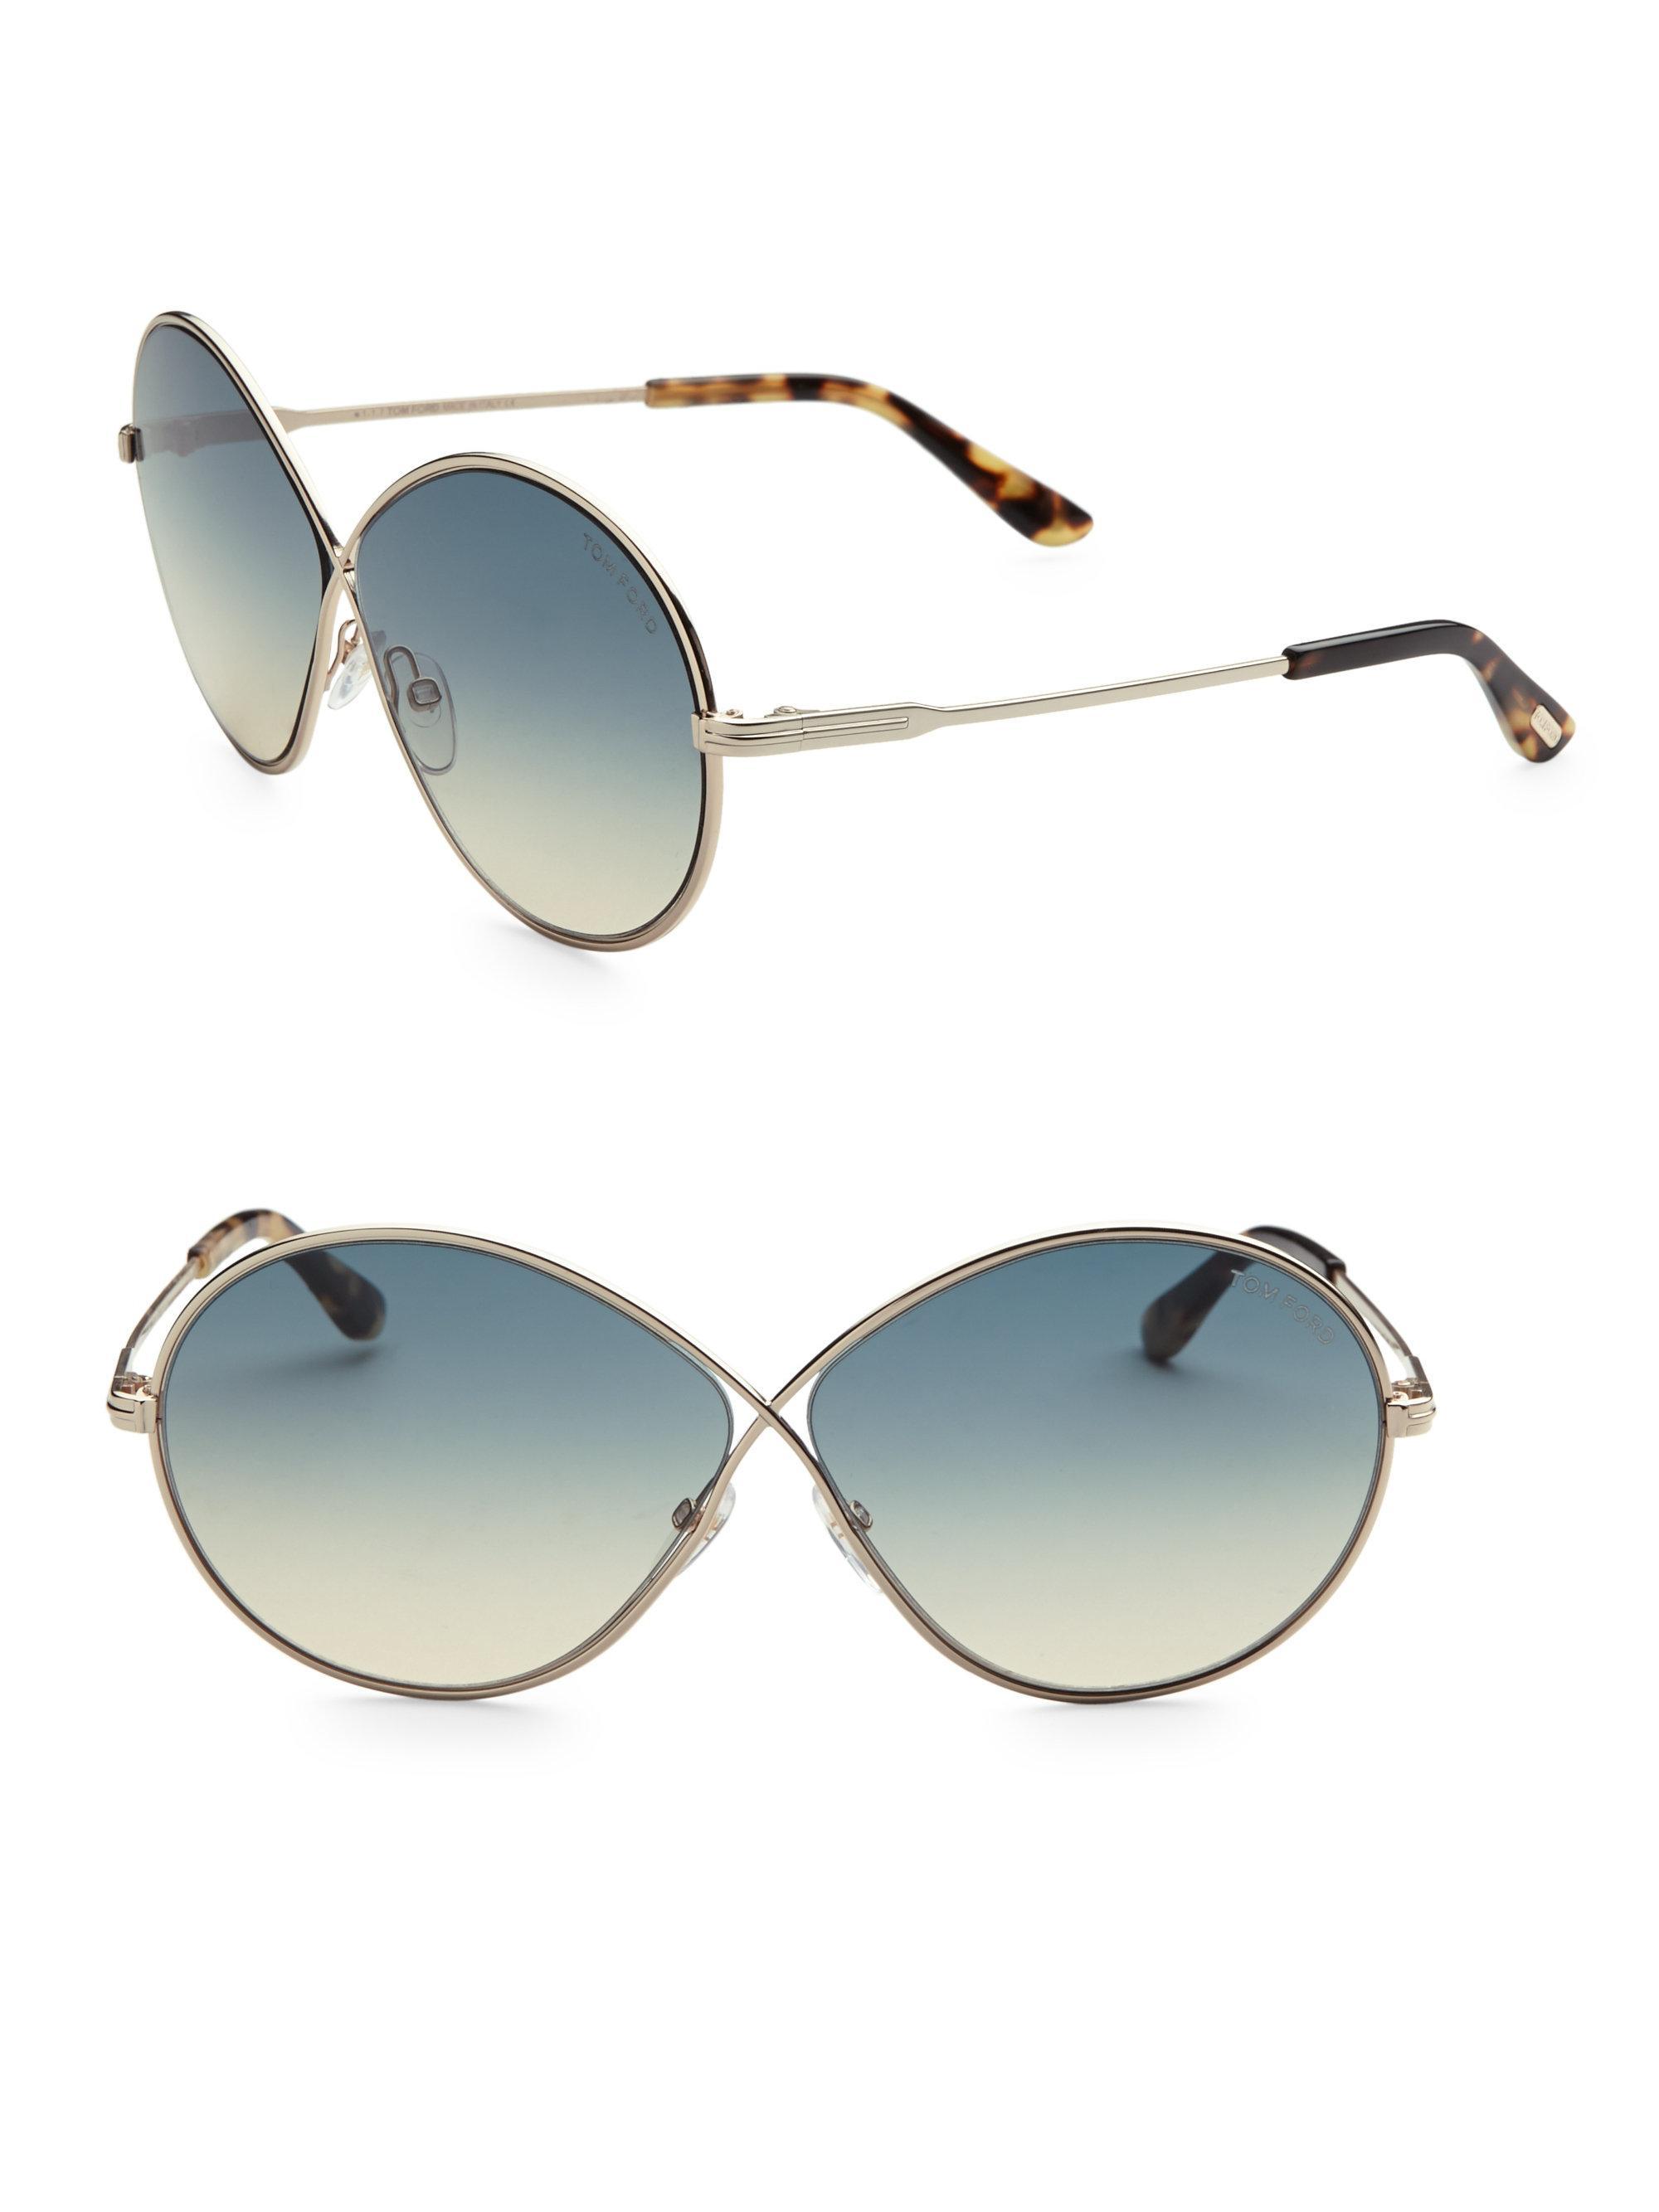 f5ec97b14da7b Tom Ford Women s Rania 64mm Oval Sunglasses - Blue Gold in Blue - Lyst